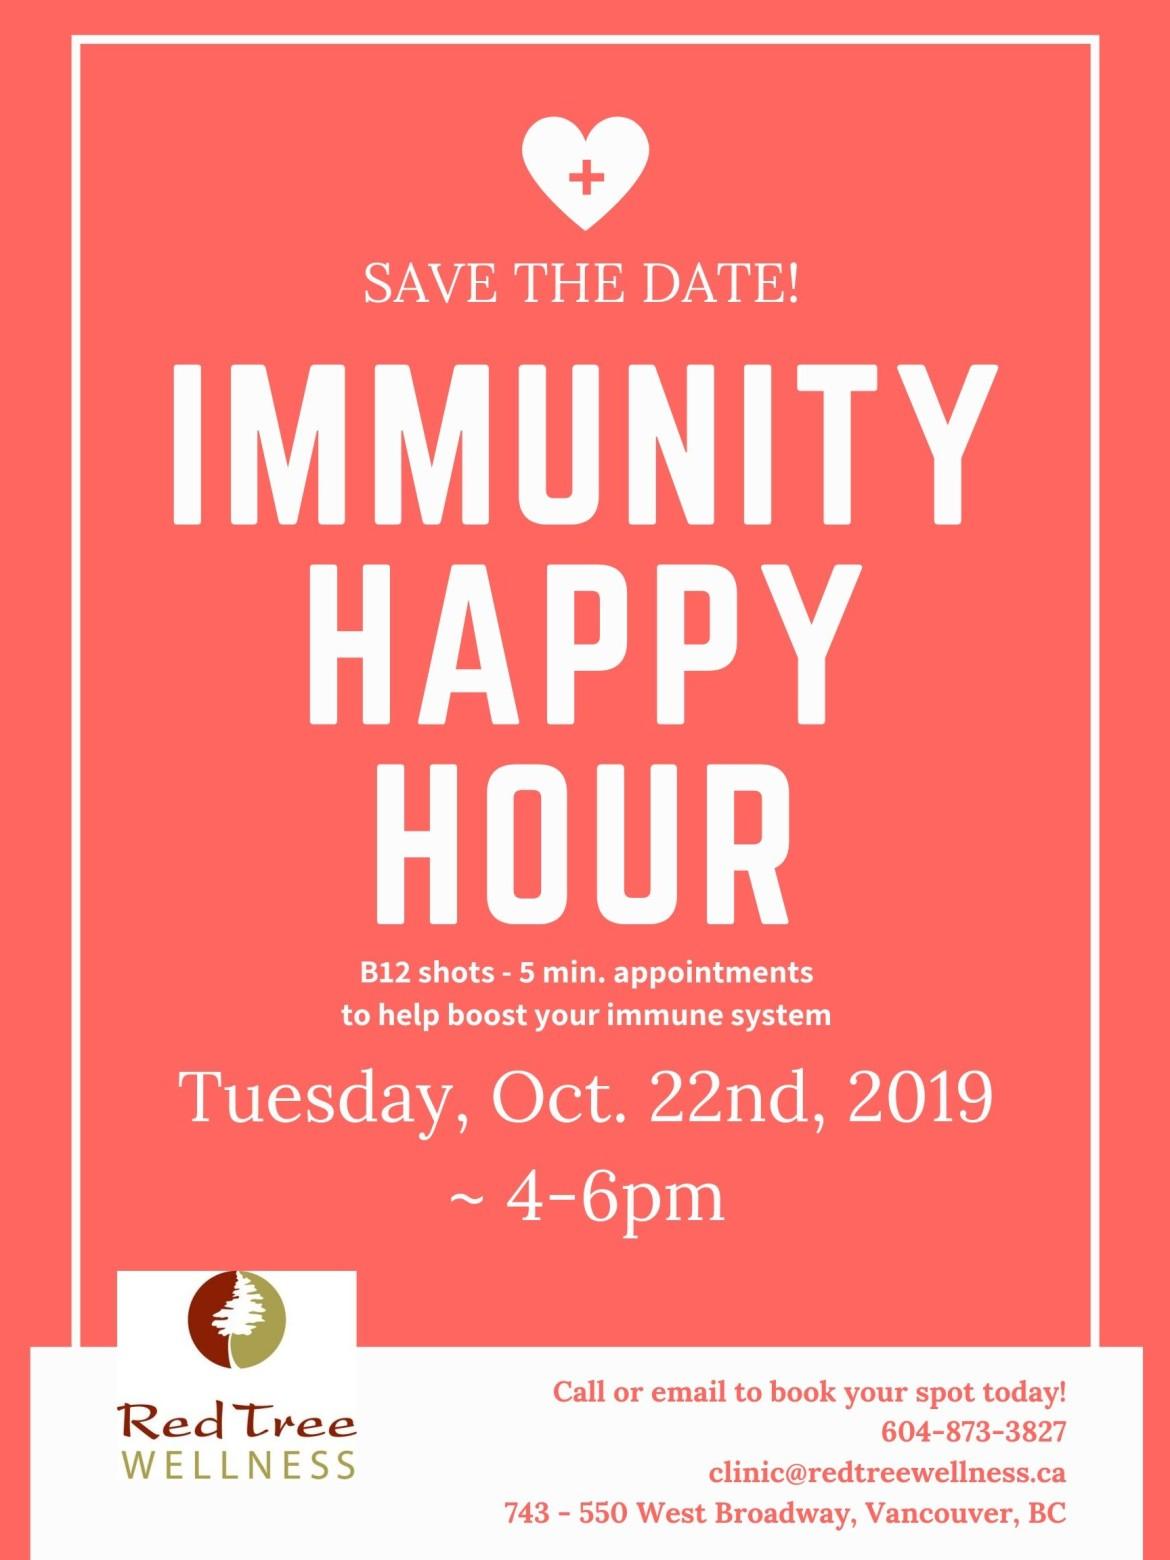 ImmunityHappyHour-2019-Oct